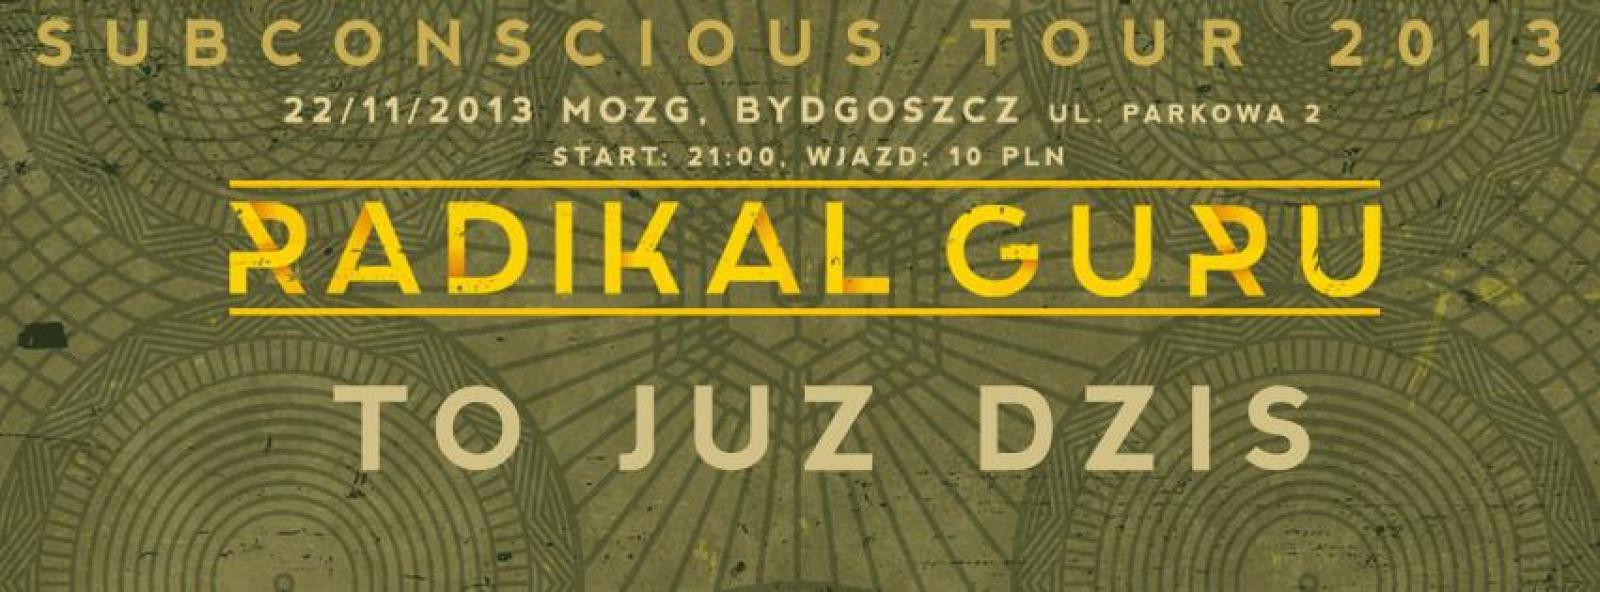 RADIKAL GURU - SUBCONSCIOUS TOUR 2013 x Feel Like Jumping Sound System x Track Numba1 x Ruff Puff